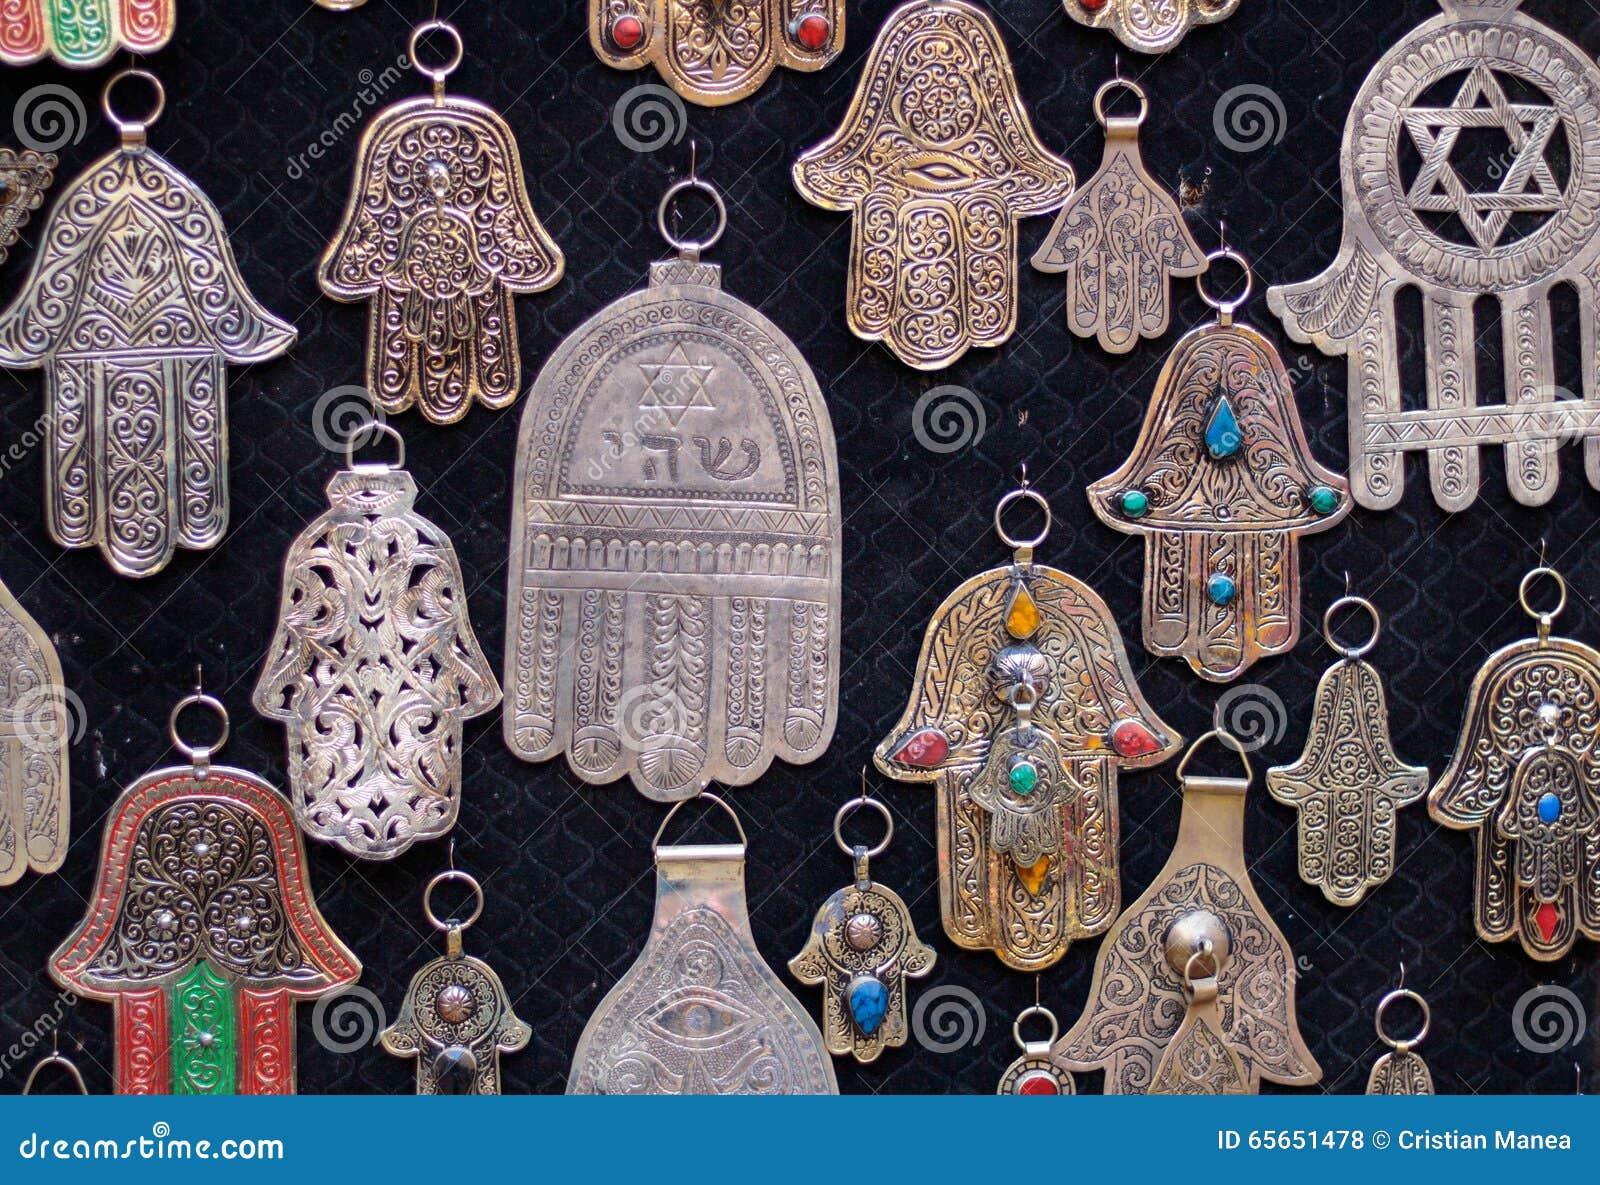 Jewish hamsa hand amulet or miriam hand stock vector palm shaped amulets hand of fatima royalty free stock photos biocorpaavc